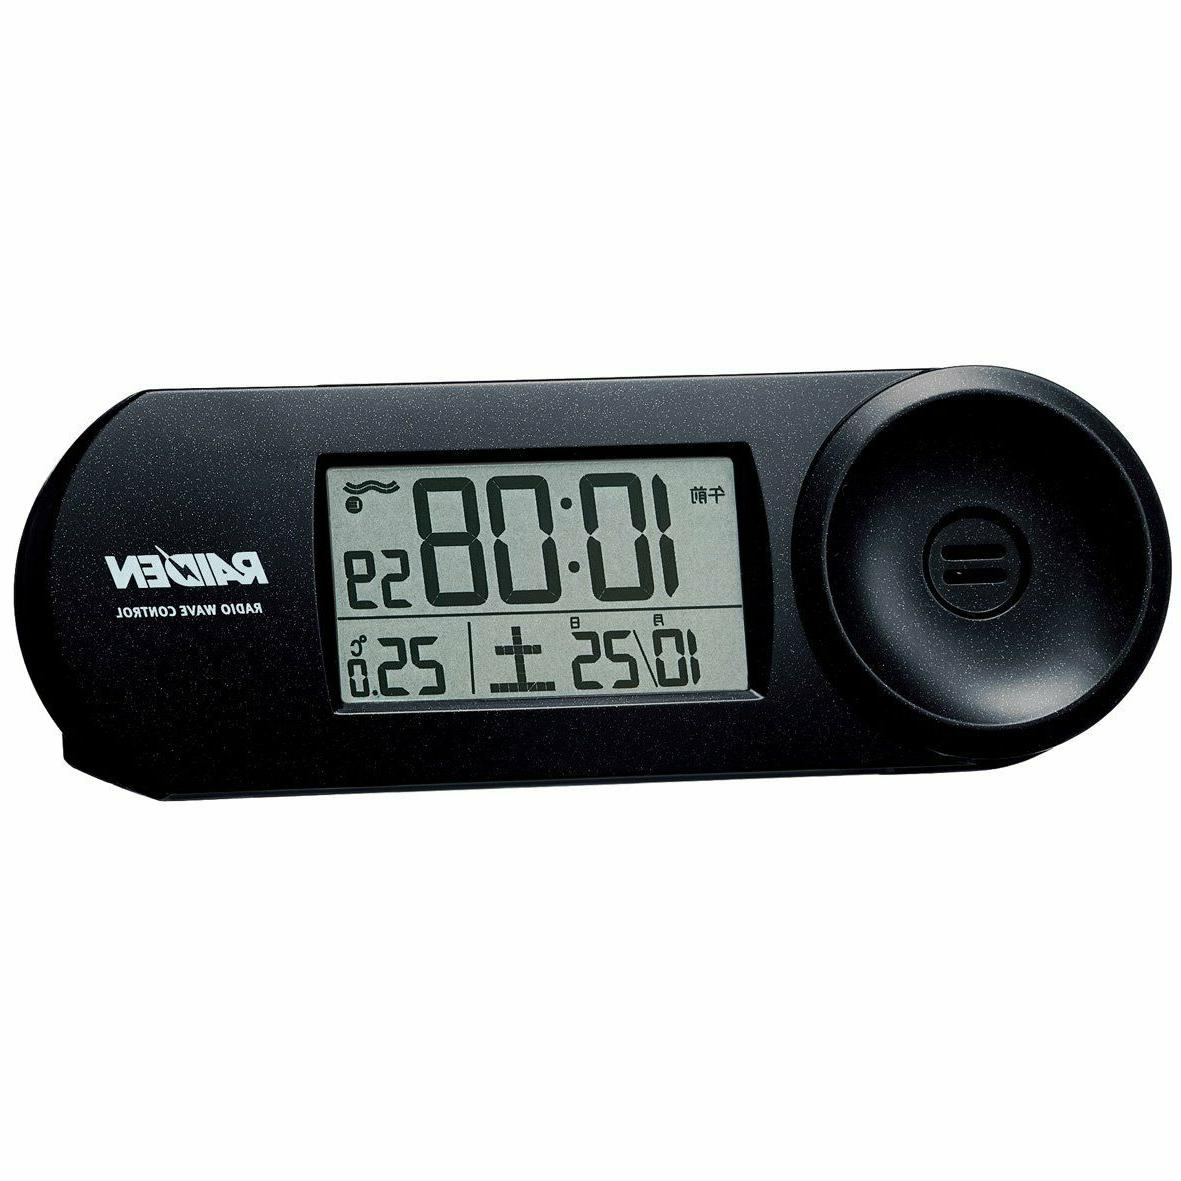 new clock raiden large volume alarm radio